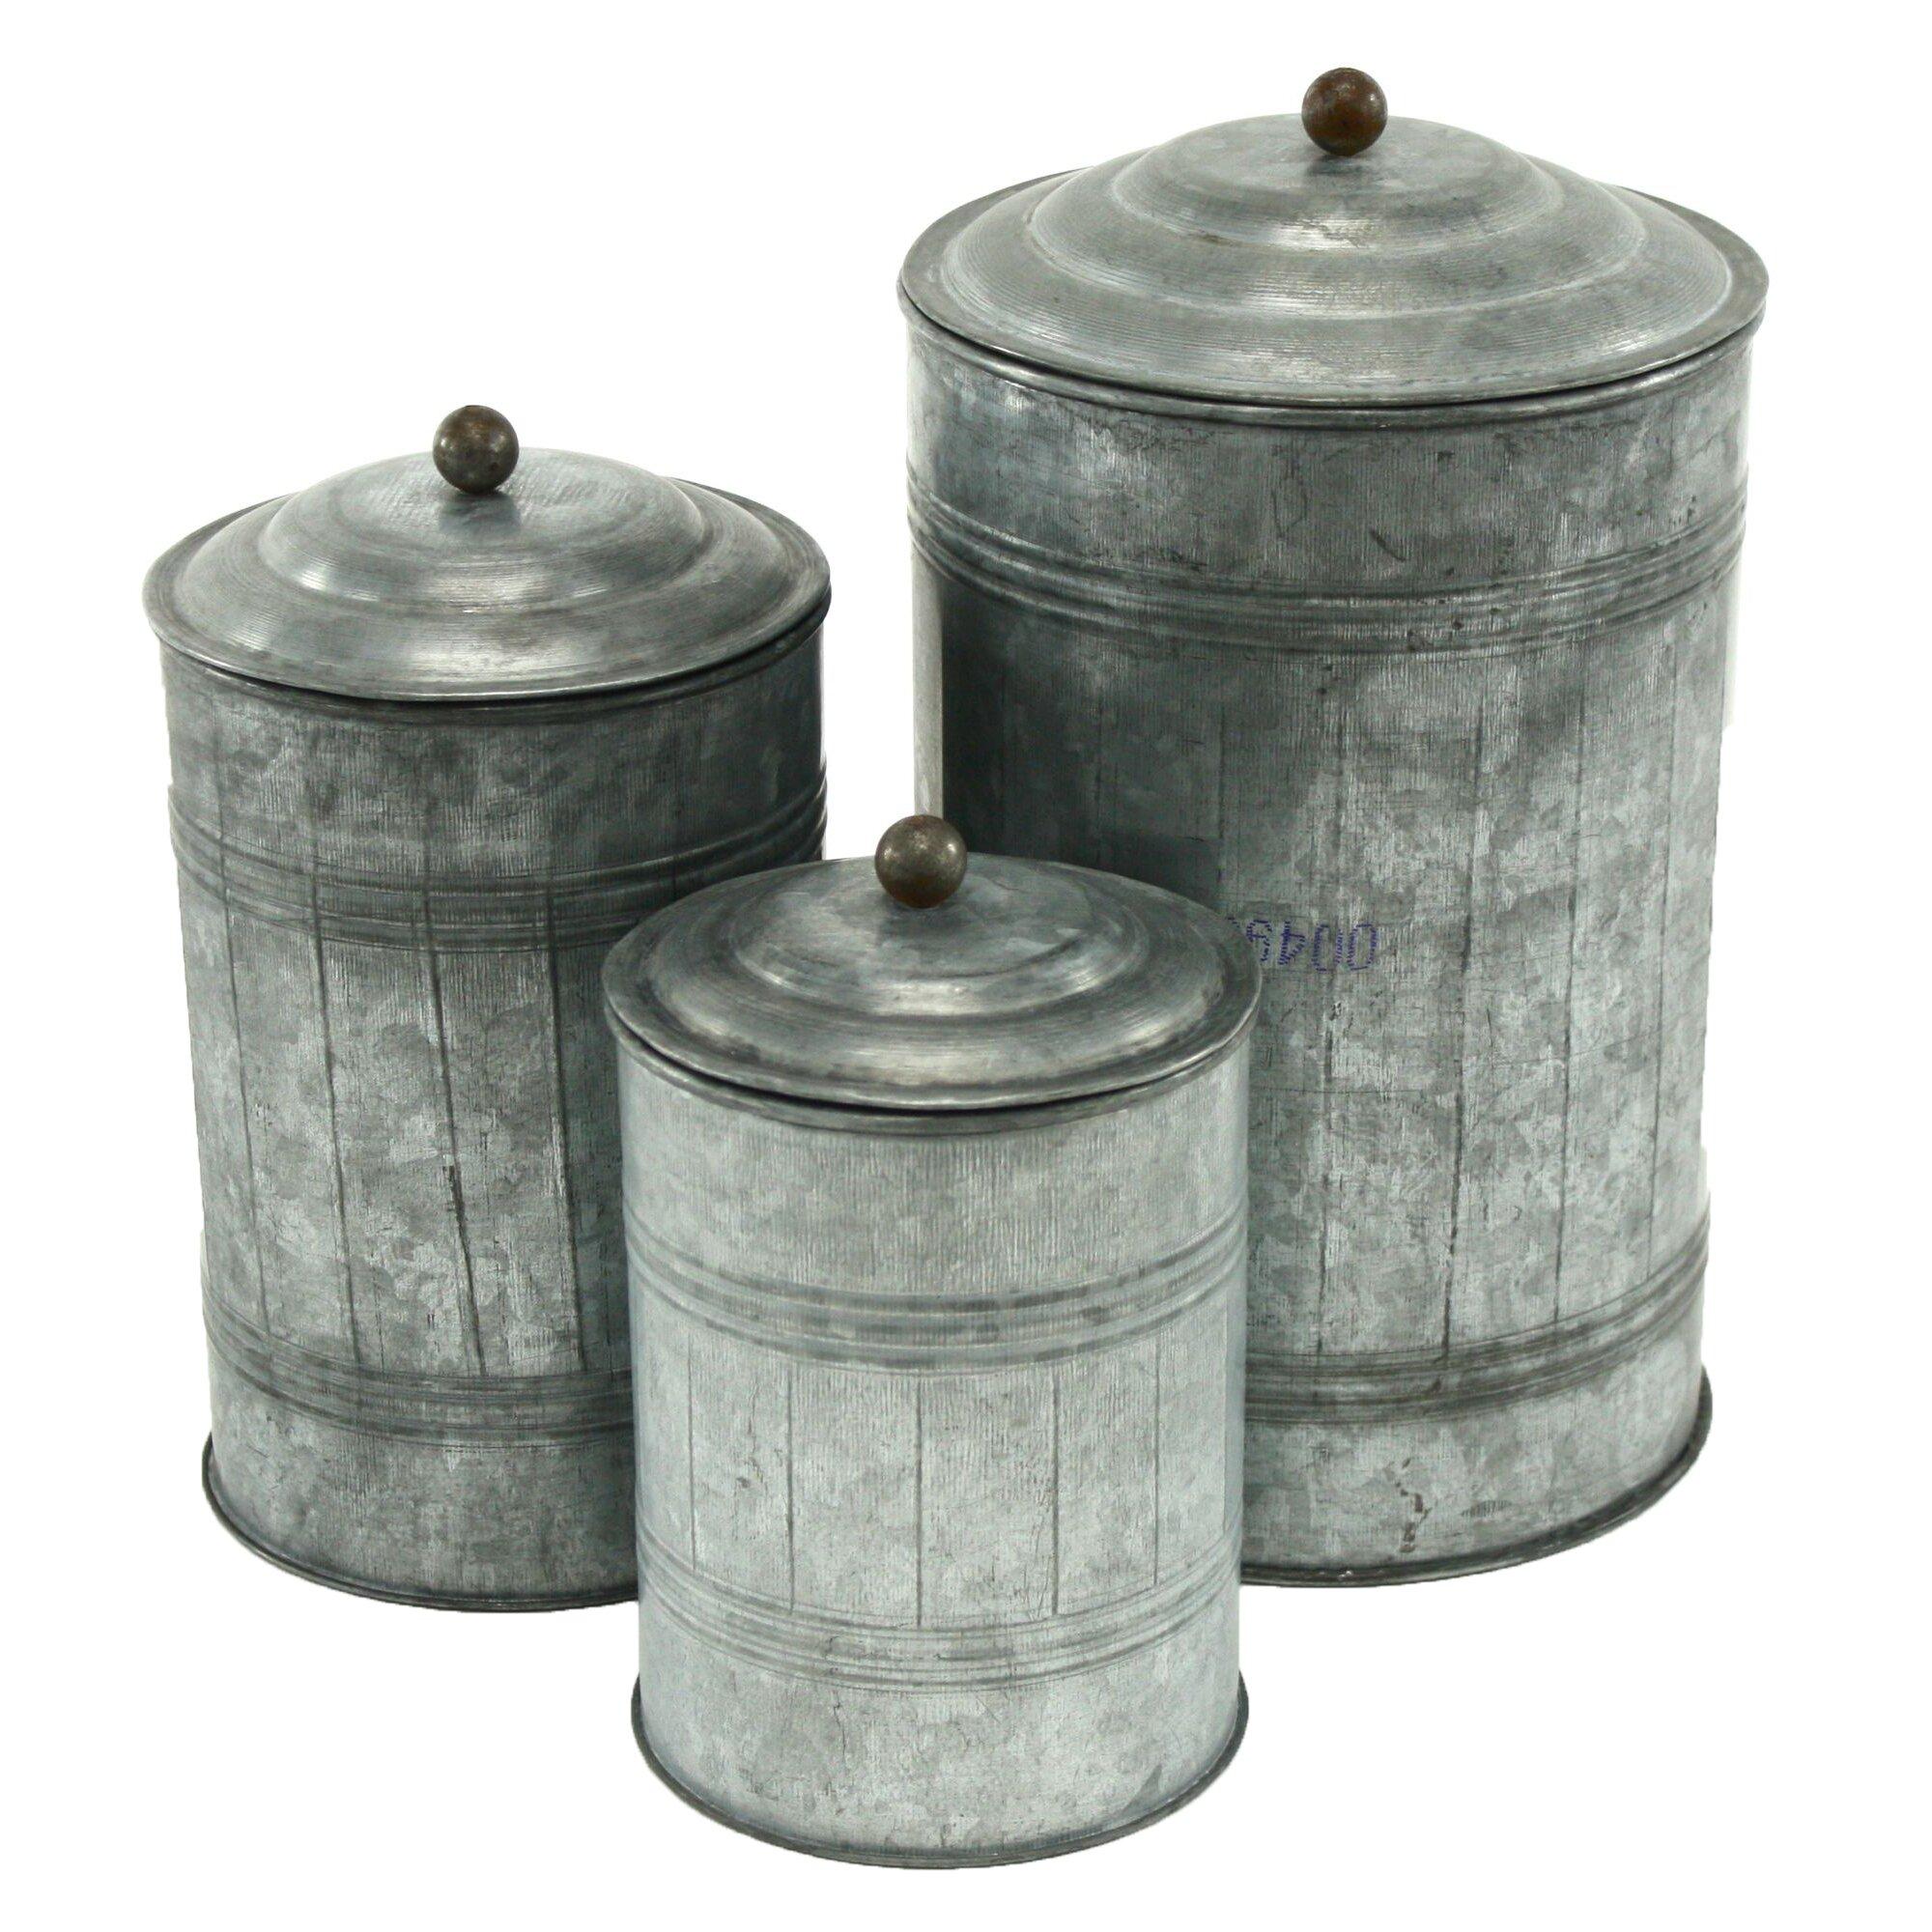 plain kitchen canister sets black for decor decorative jar intended decor kitchen canister sets black